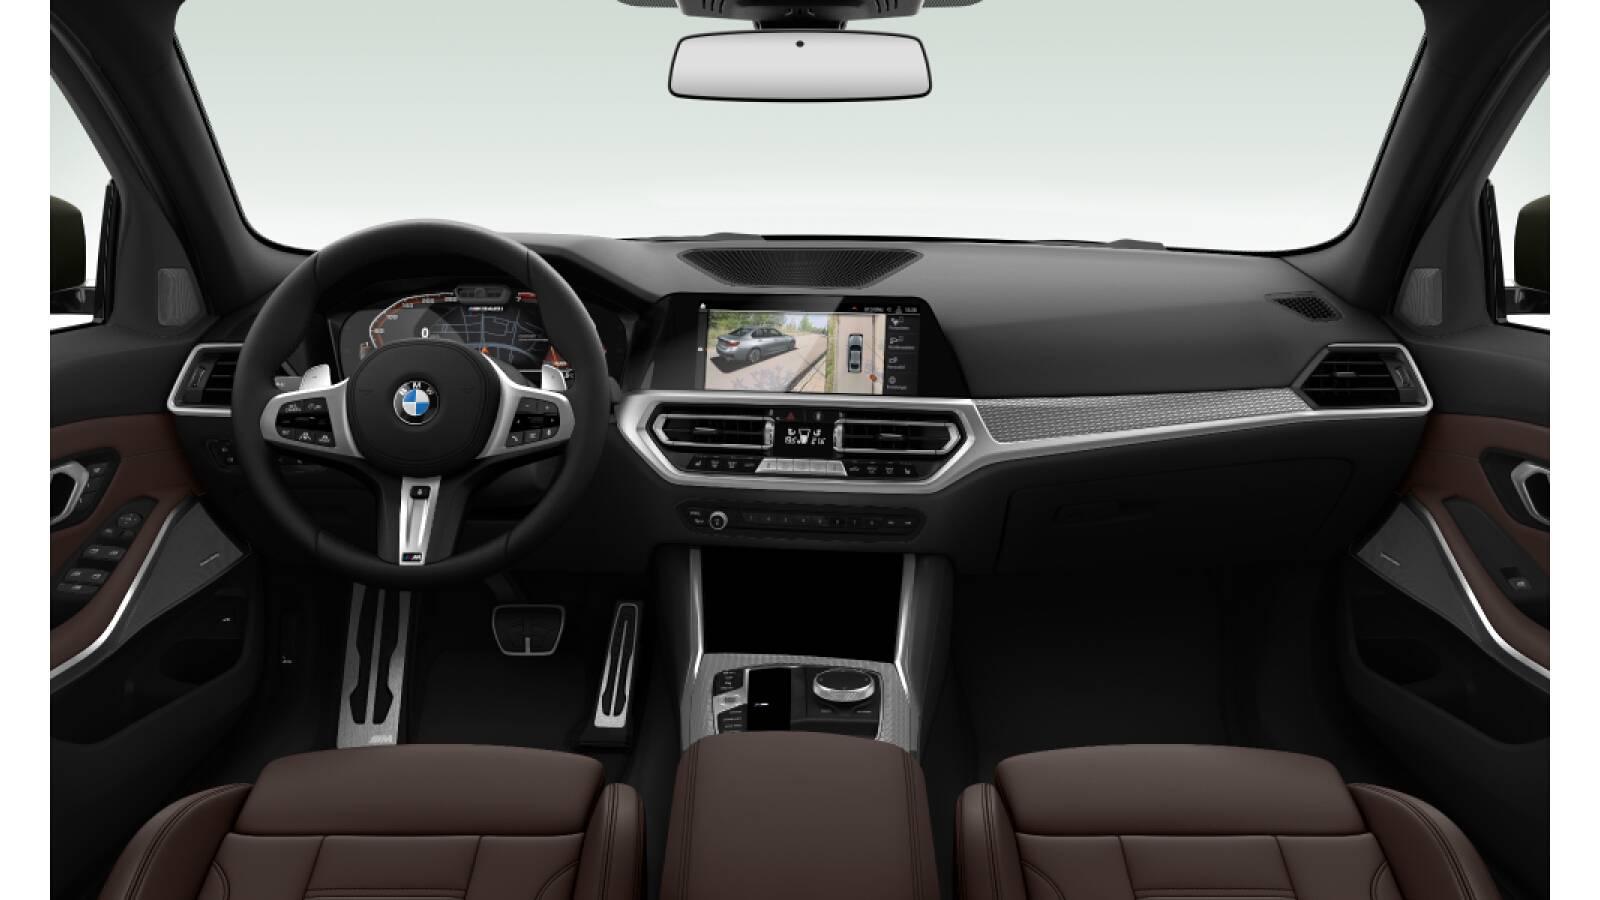 BMW 3 Series 2019 leaked photos (22)